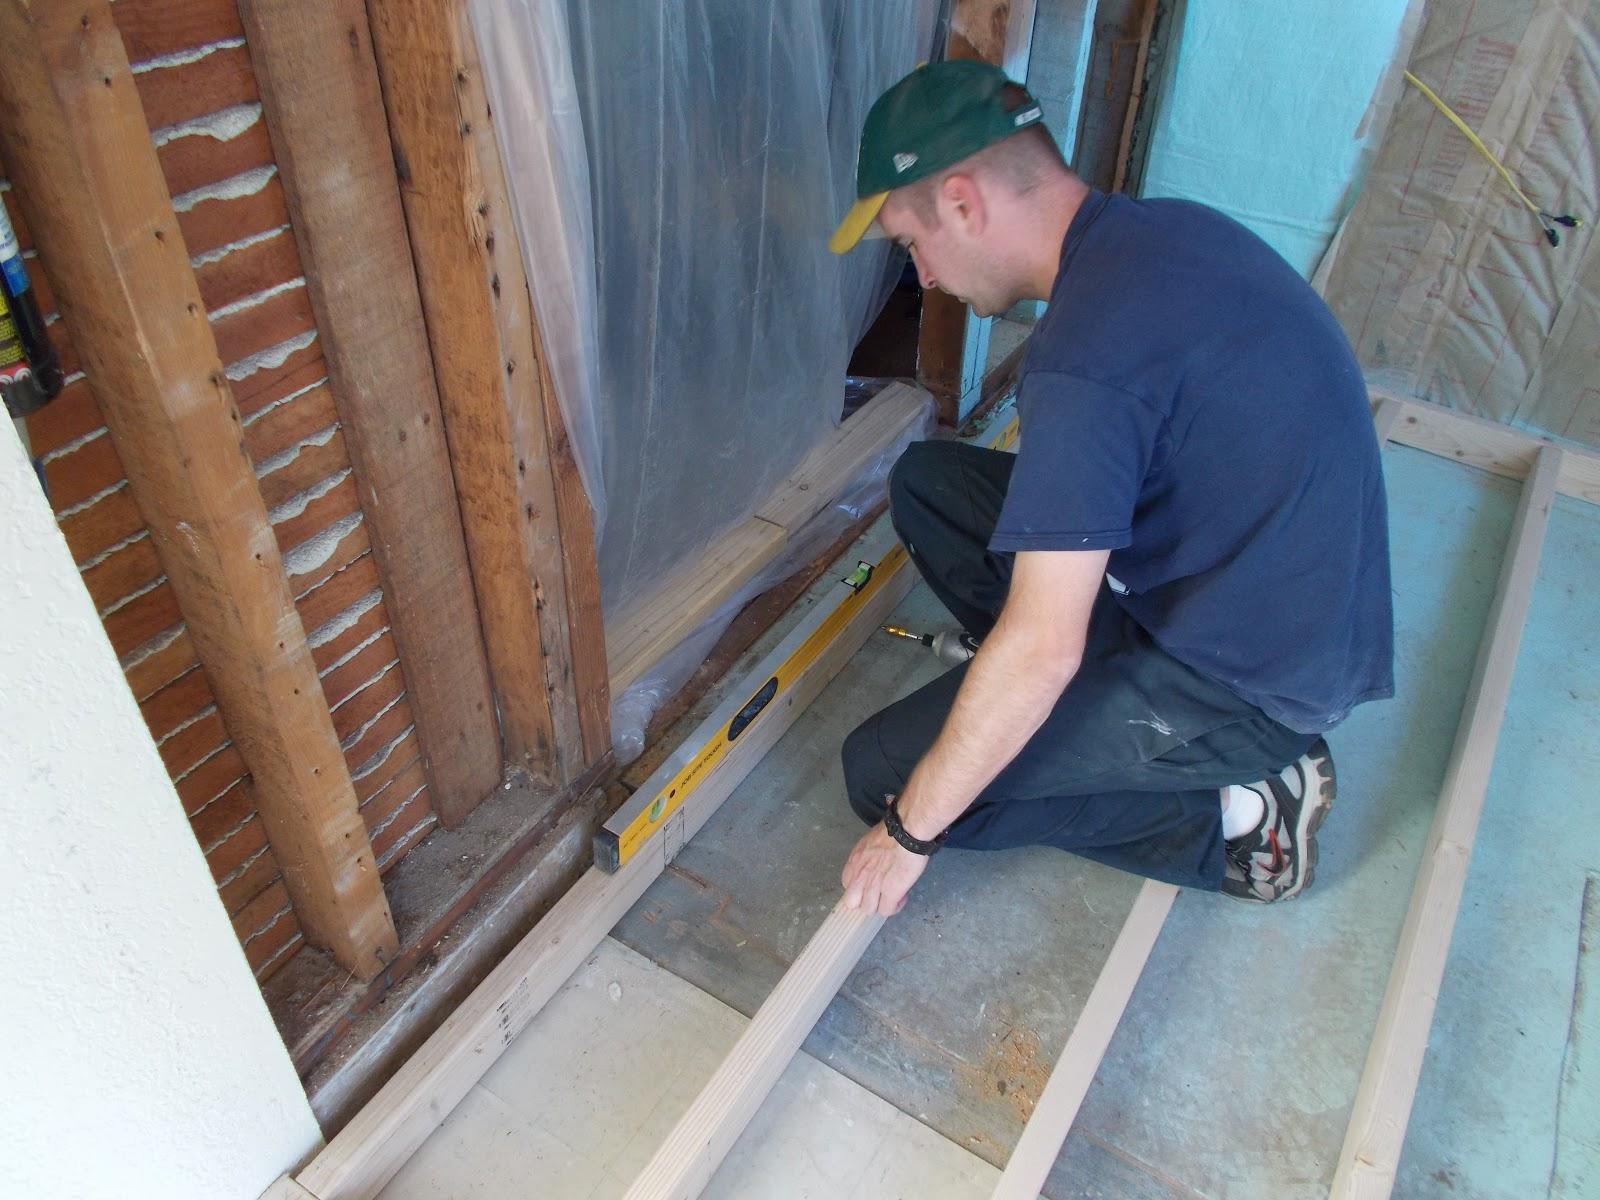 Leveling The Bathroom Floor - Leveling bathroom floor